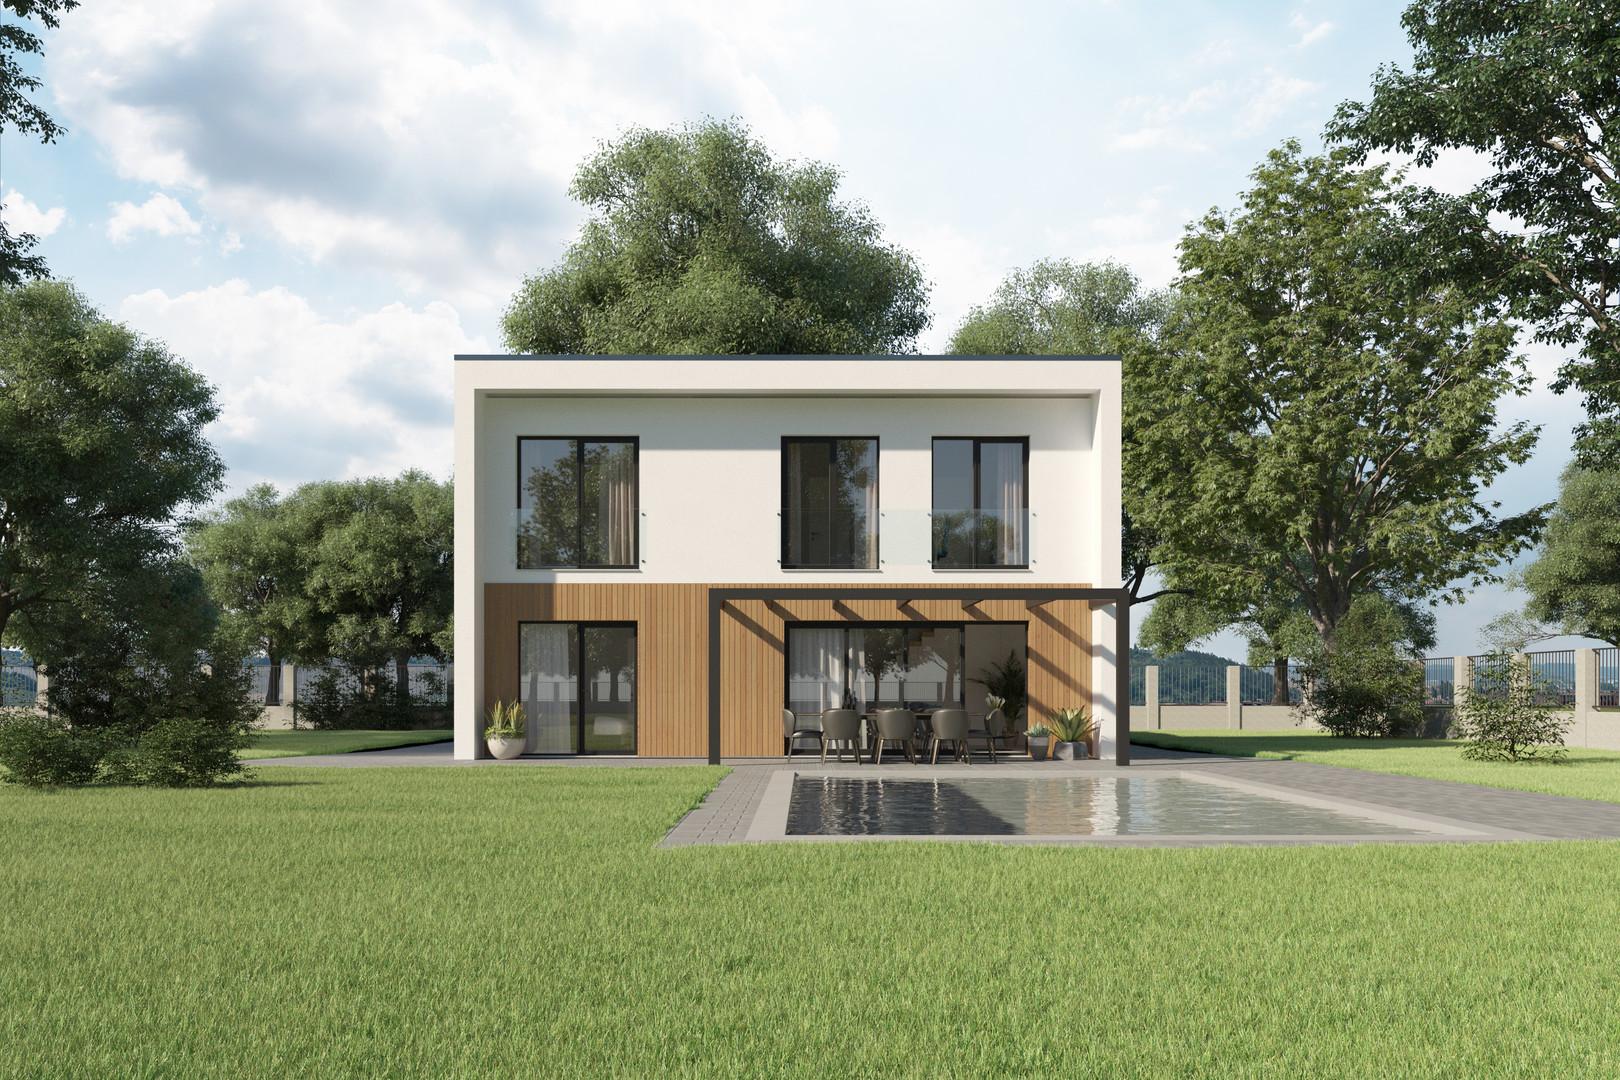 House_4_view1.jpg